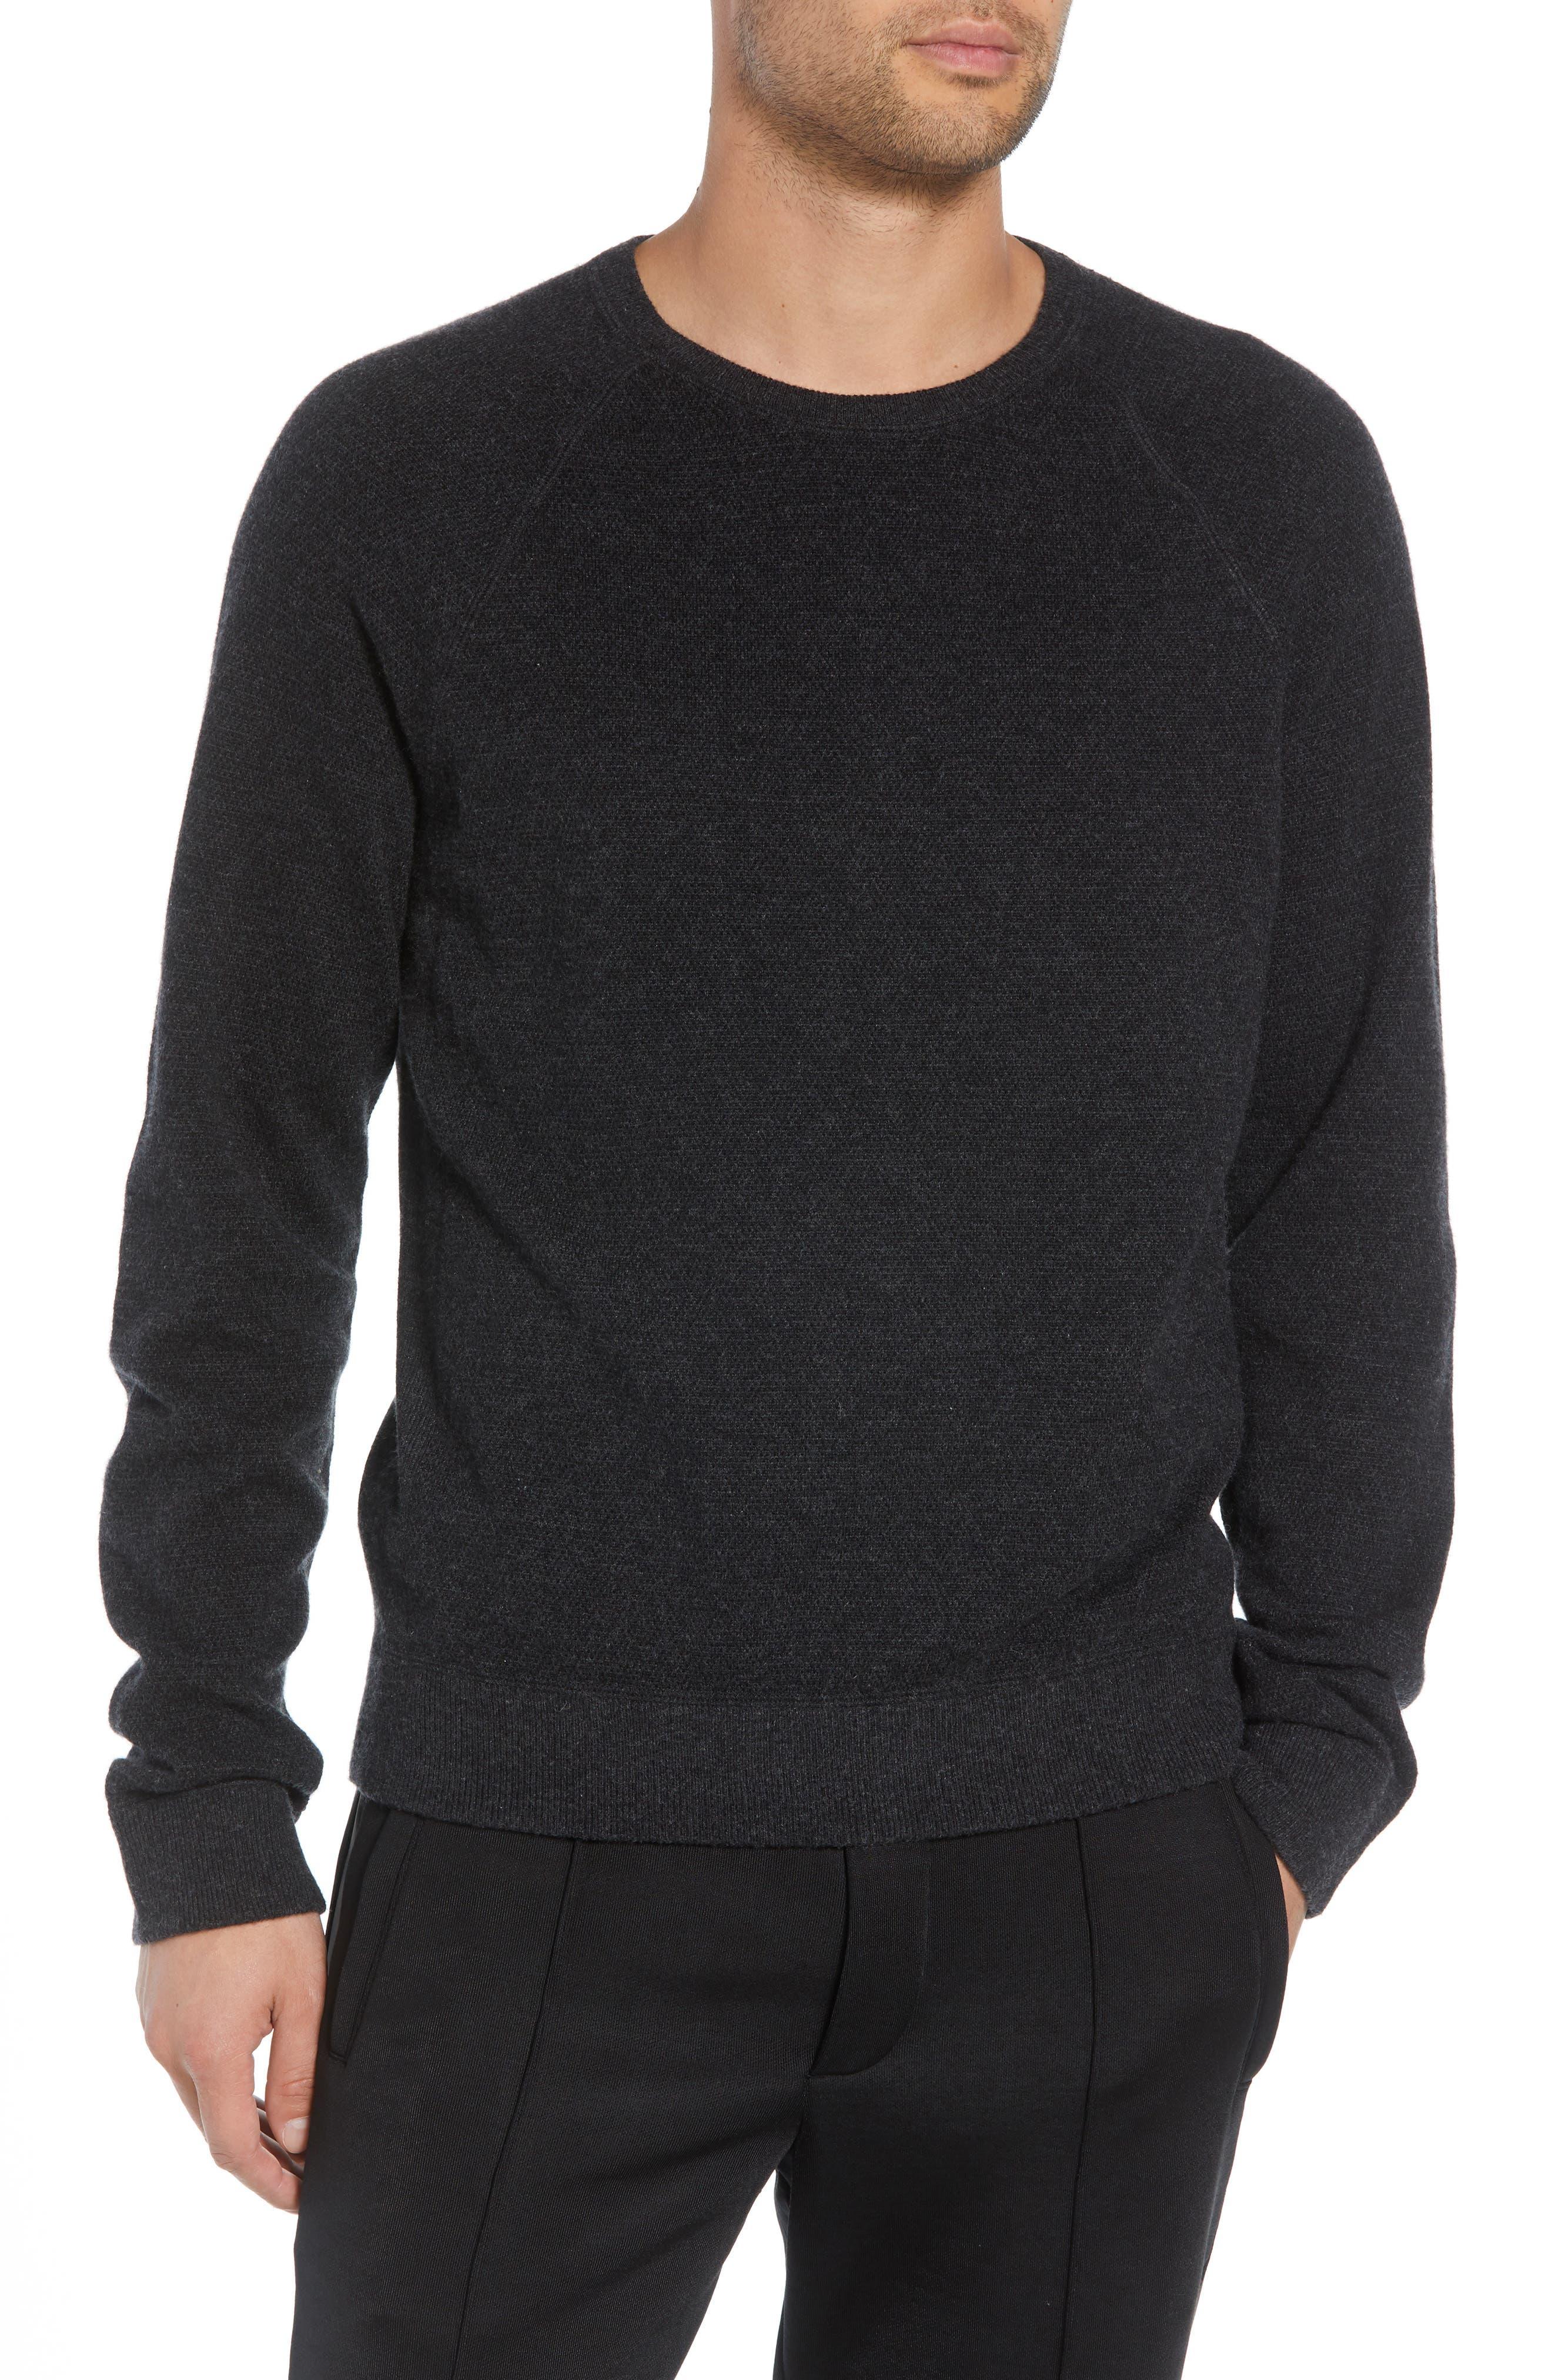 Bird's Eye Sweater,                         Main,                         color, H CHARCOAL/ BLACK